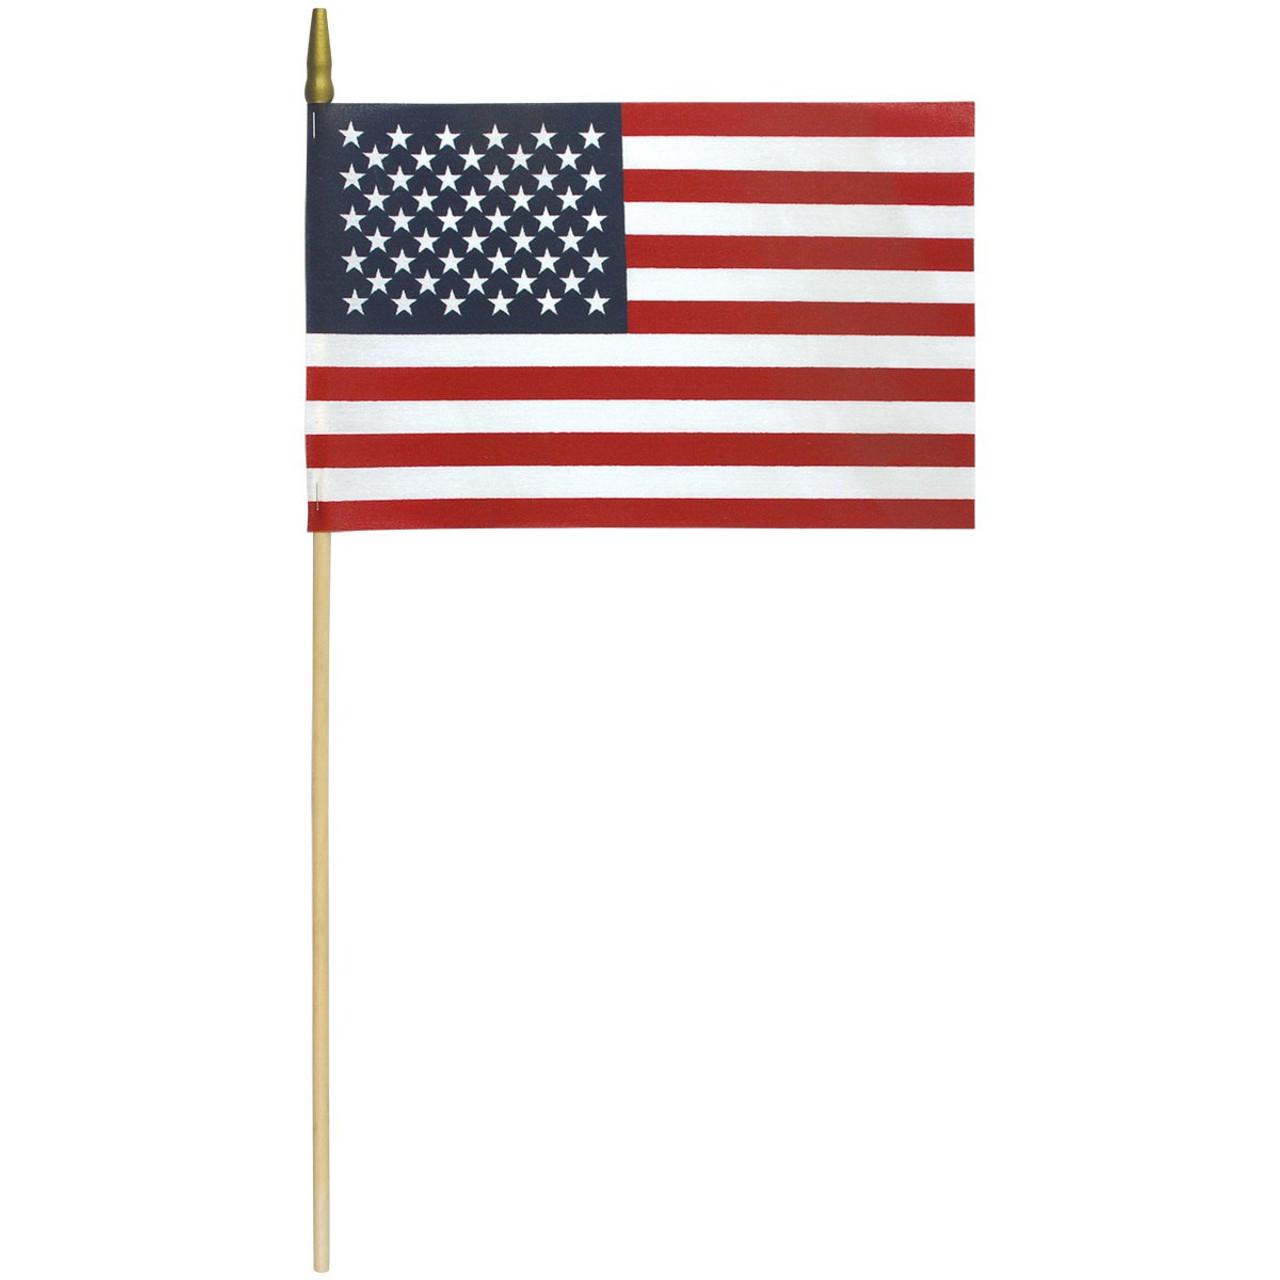 American Flag, Stick Flag, Handheld, 8in x 12in, HHUS812